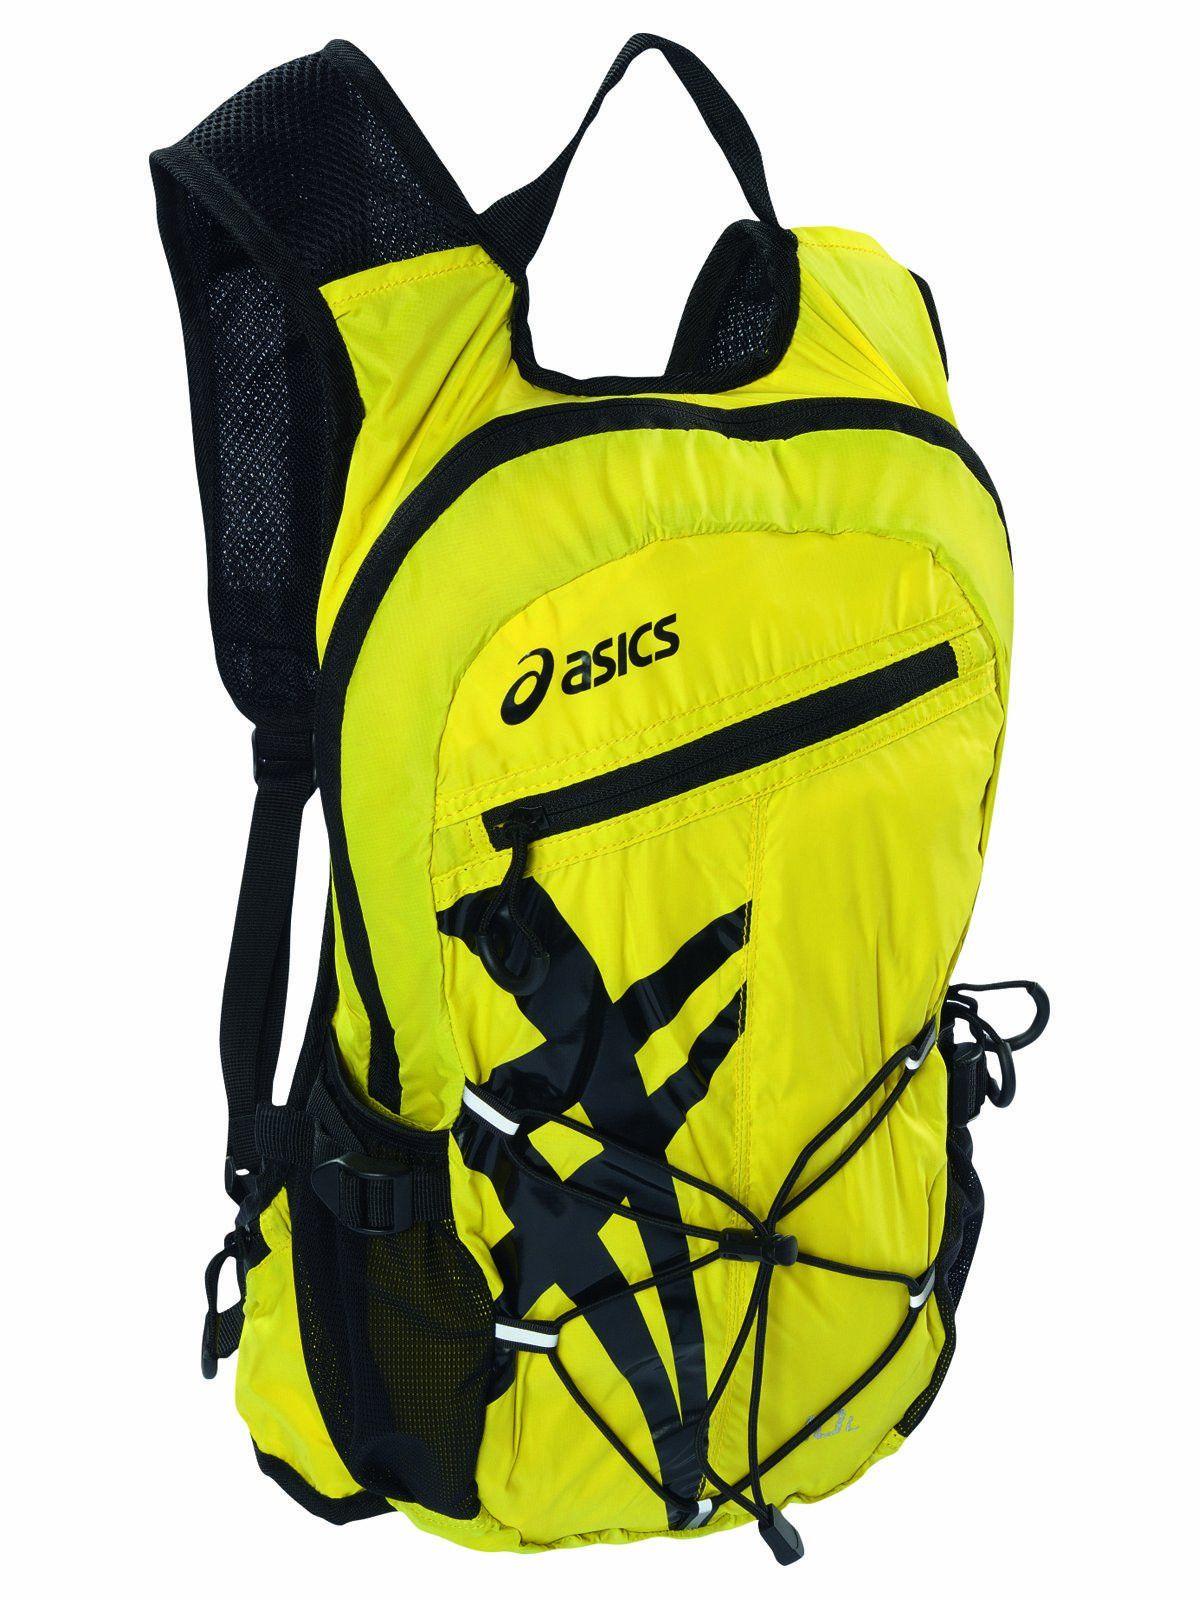 Asics Lightweight Running Backpack Blazing Yellow, One